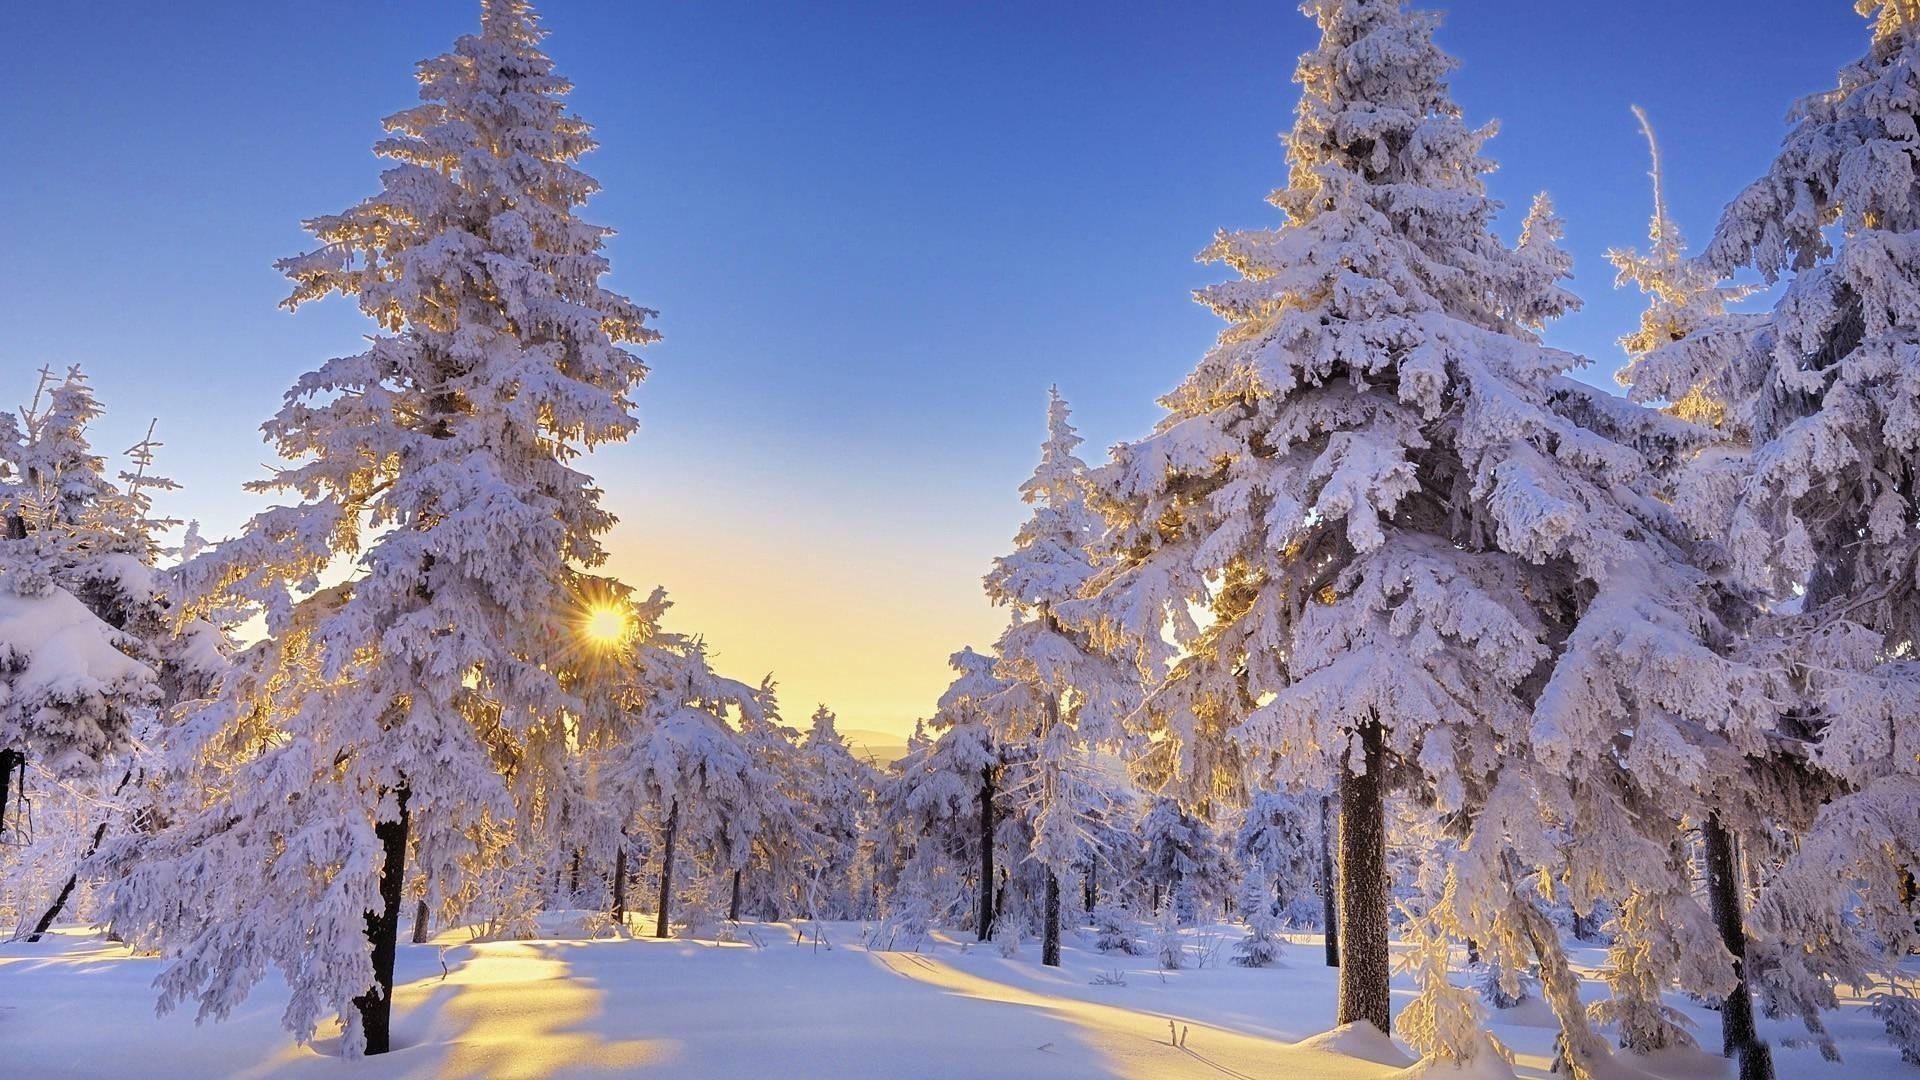 Beautiful winter wonderland wallpaper 43 images - Winter desktop ...